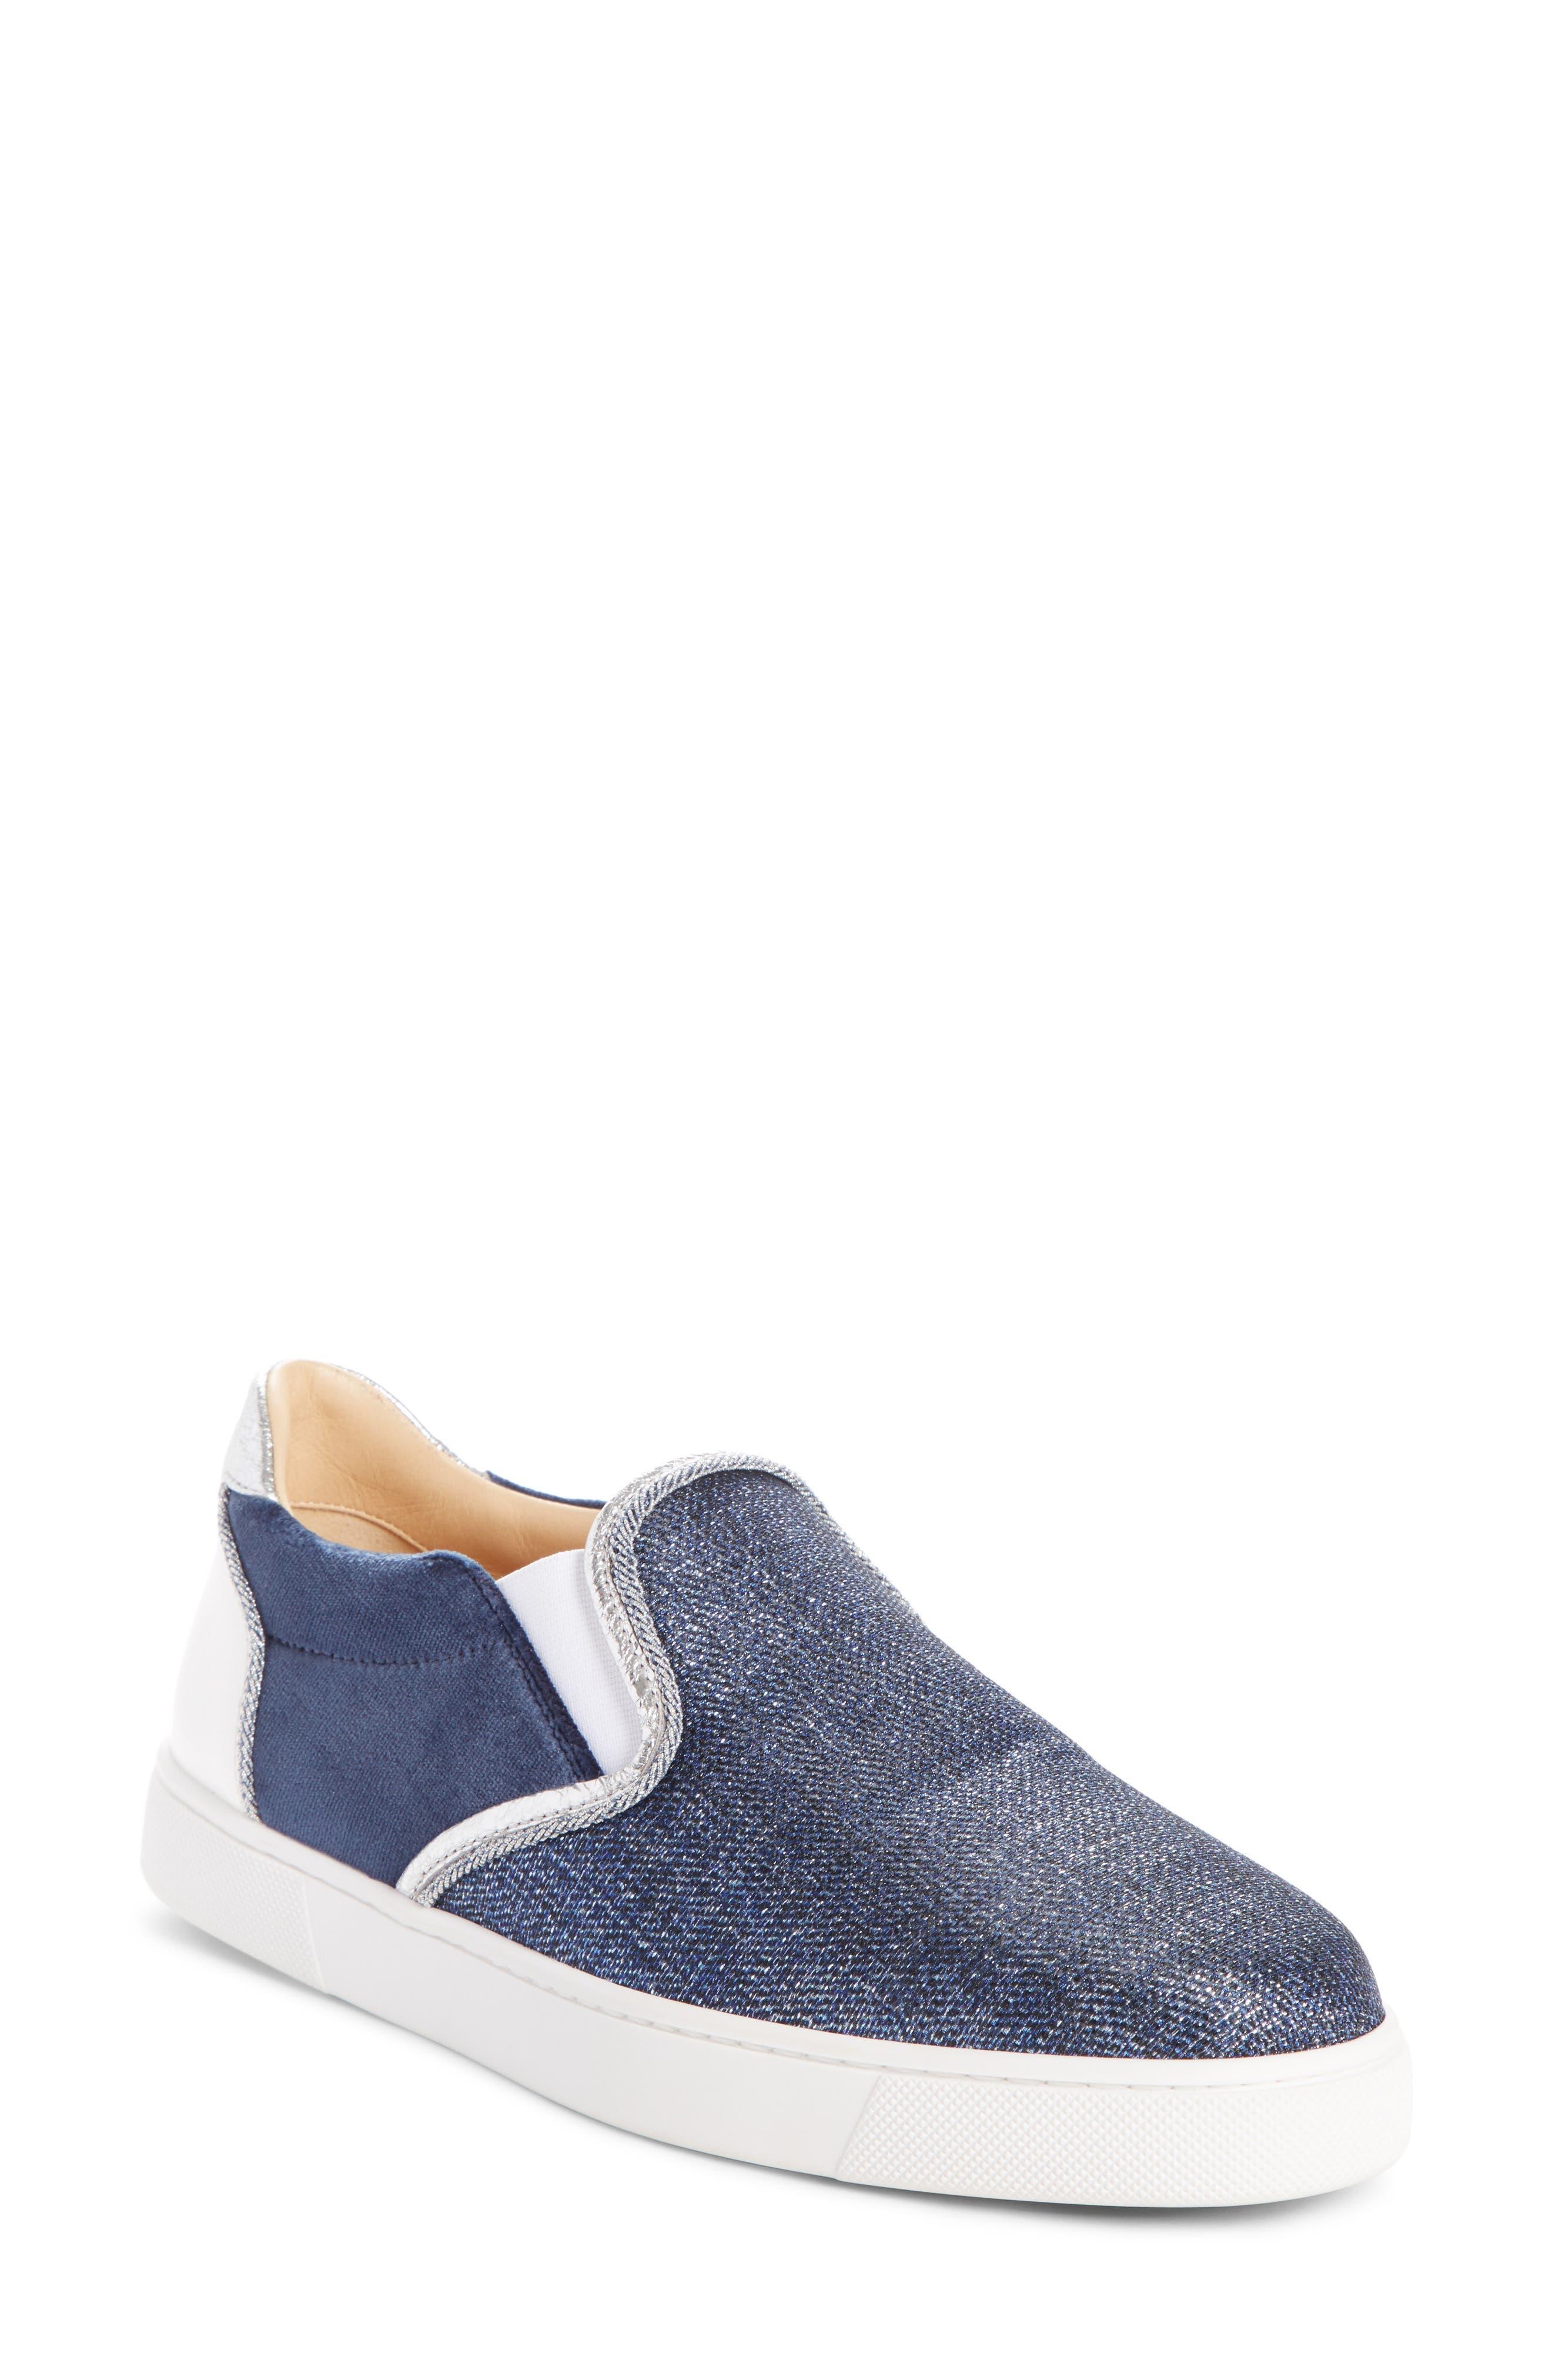 Masteralta Slip-On Sneaker,                             Main thumbnail 1, color,                             400